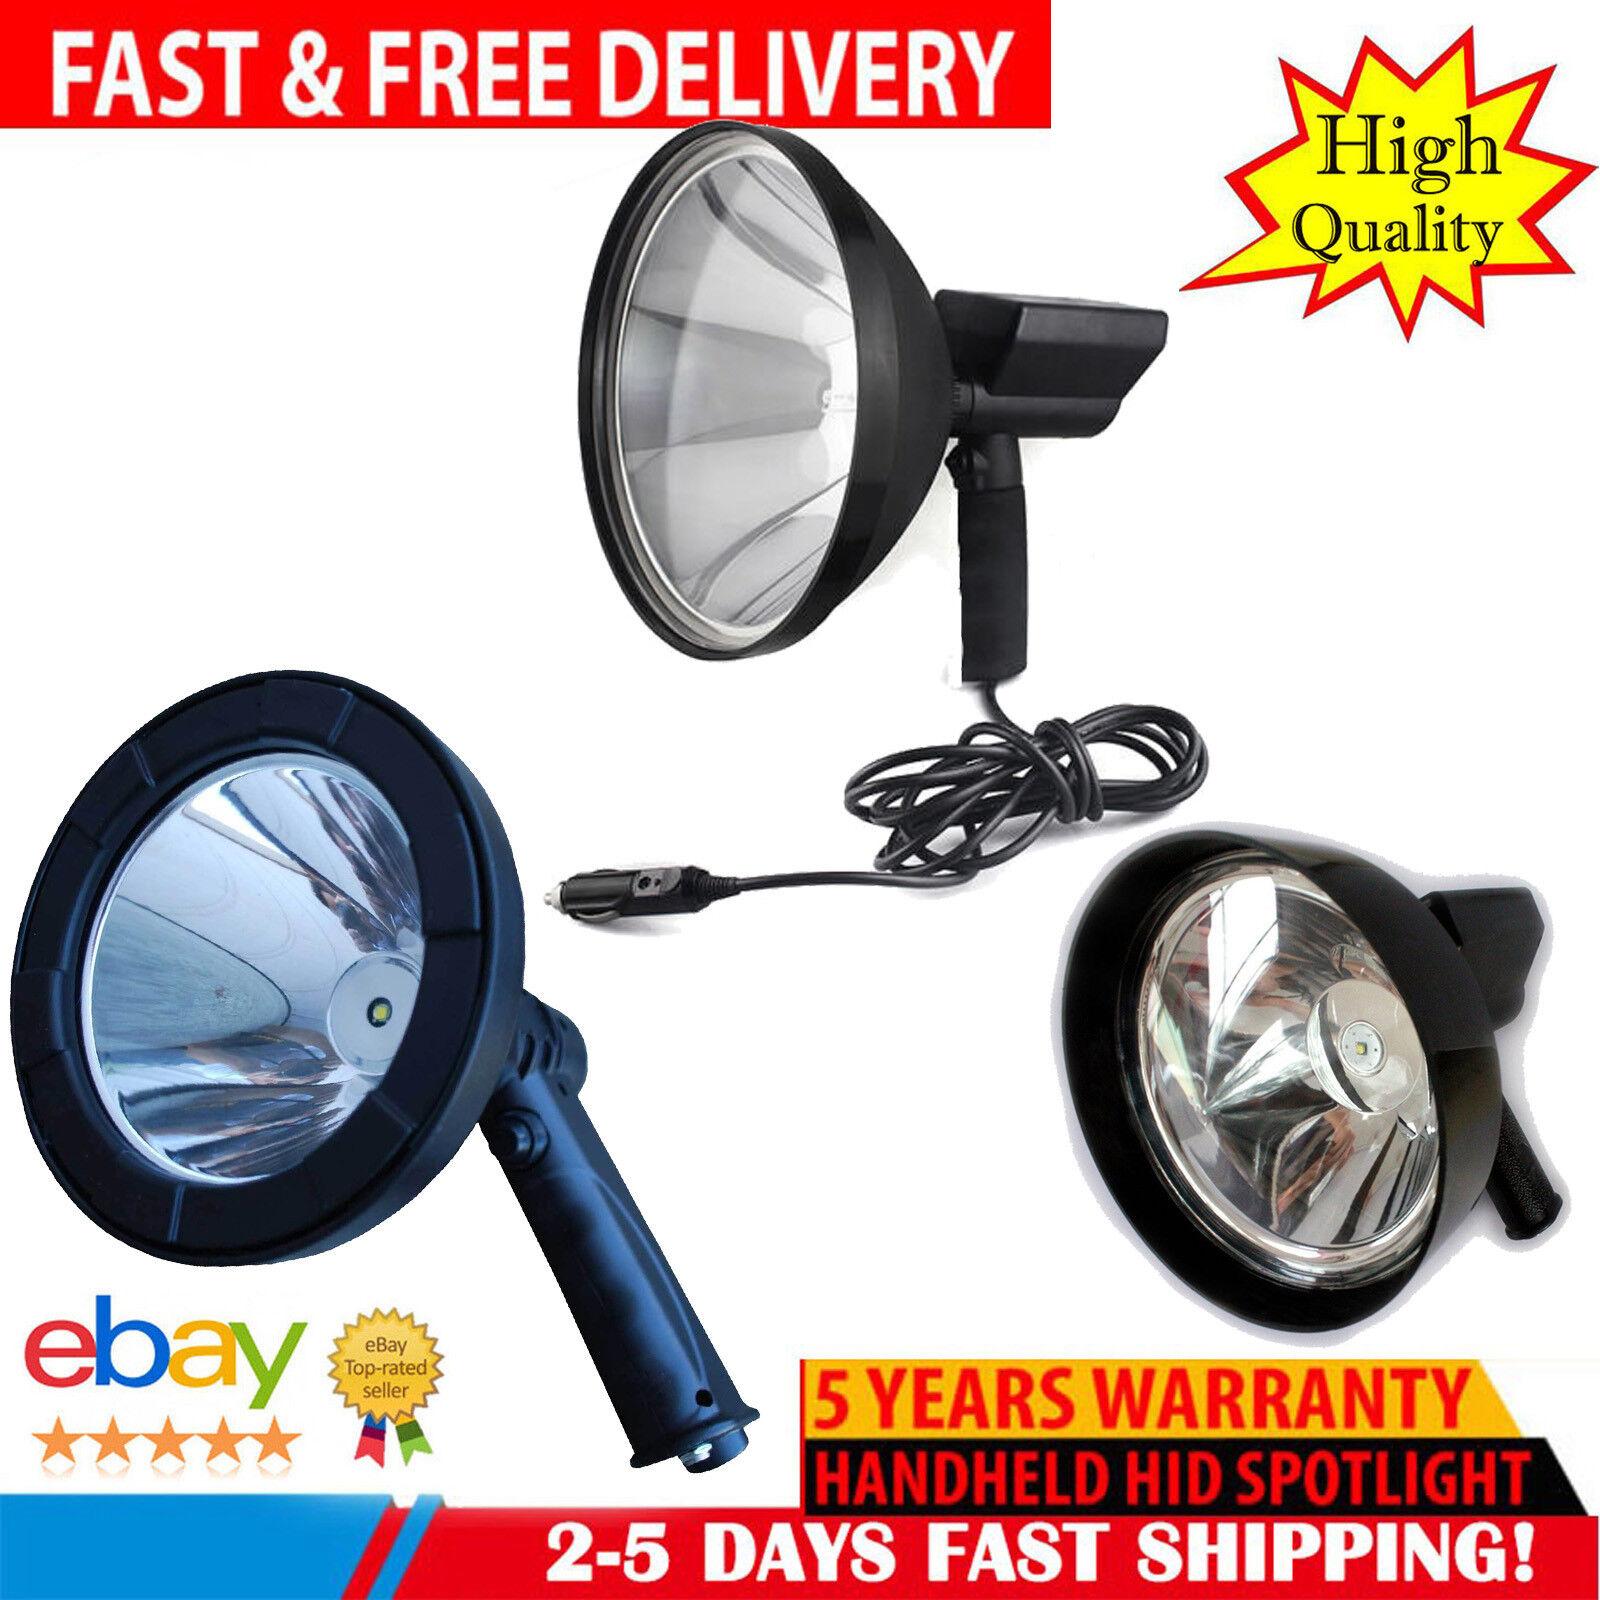 1000W HID Hand held LED Car Camping Spot Light Spotlight Hunting Fishing OffRoad